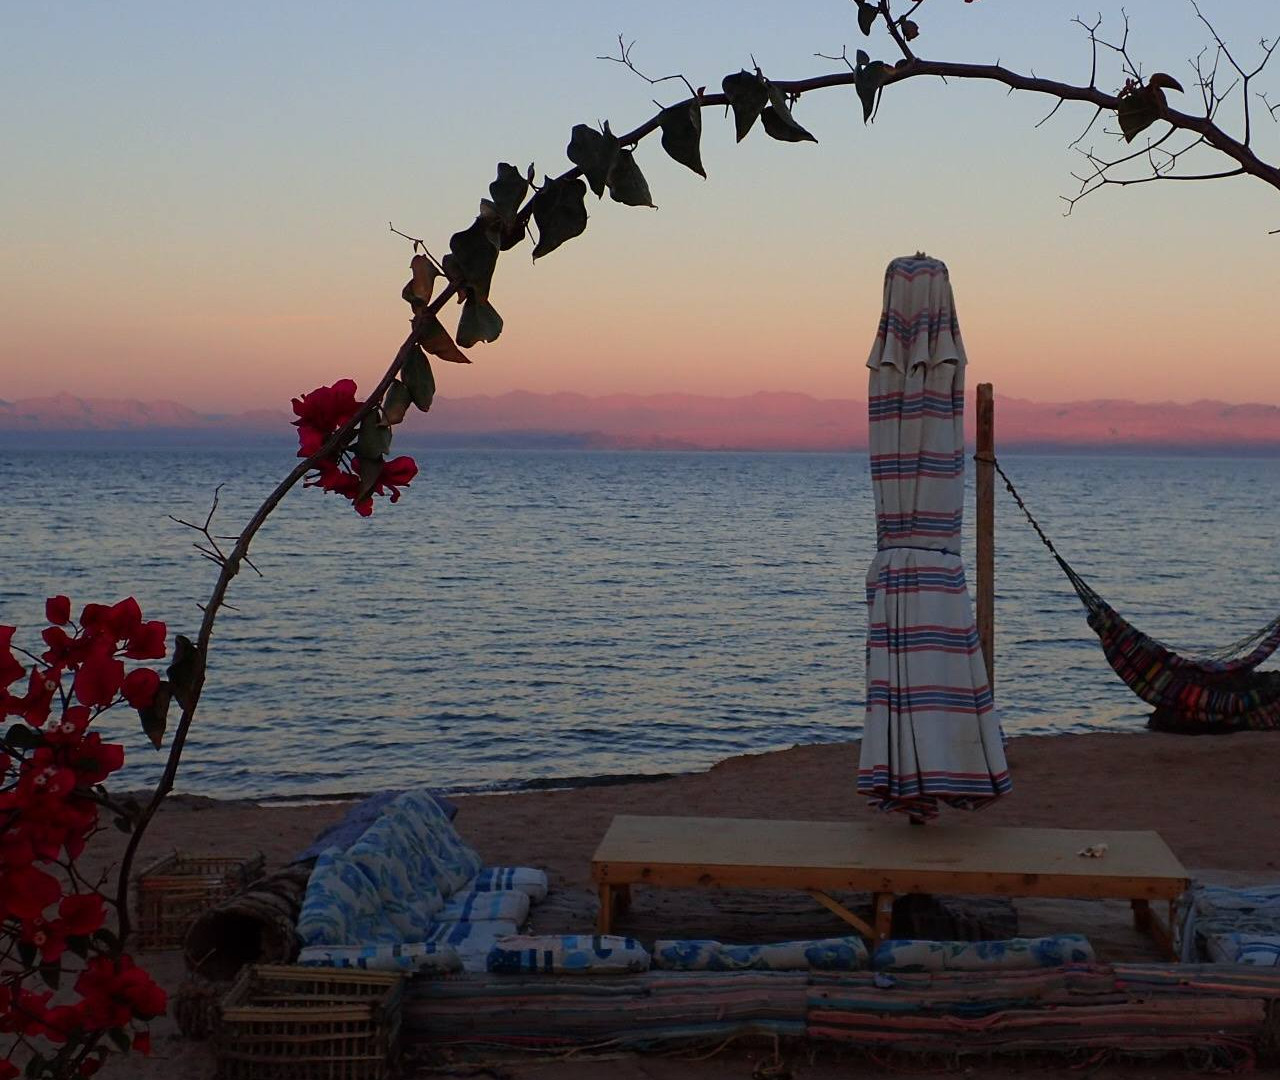 Sunset at Bedouin Star | Ras shetan